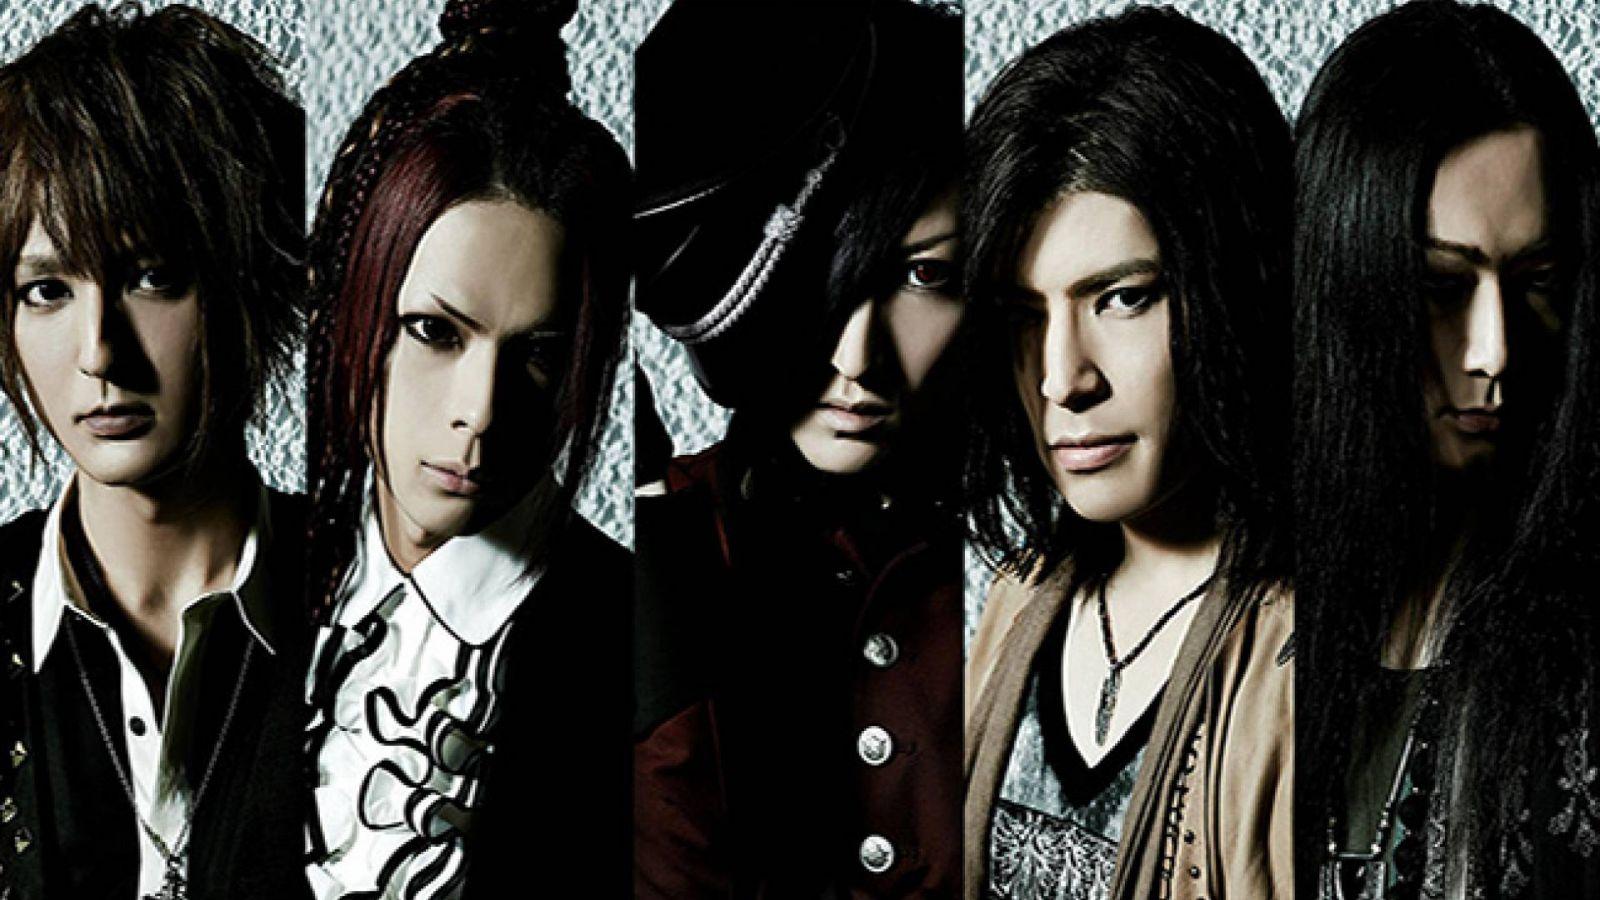 Matenrou Opera anuncia novo single © Matenrou Opera, All Rights Reserved